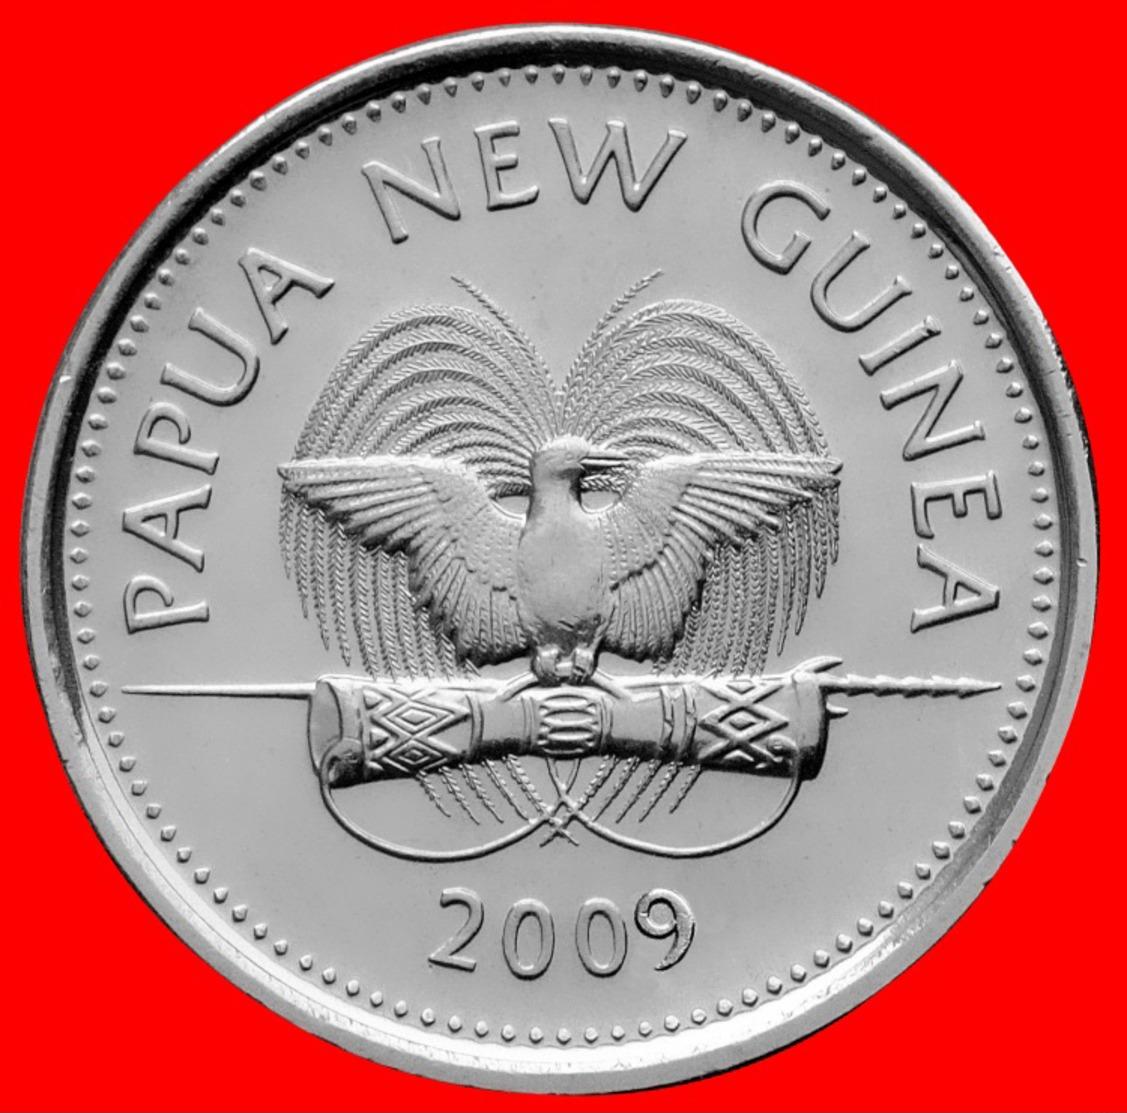 Papua New Guinea, 5 Toa 2009 - Papouasie-Nouvelle-Guinée